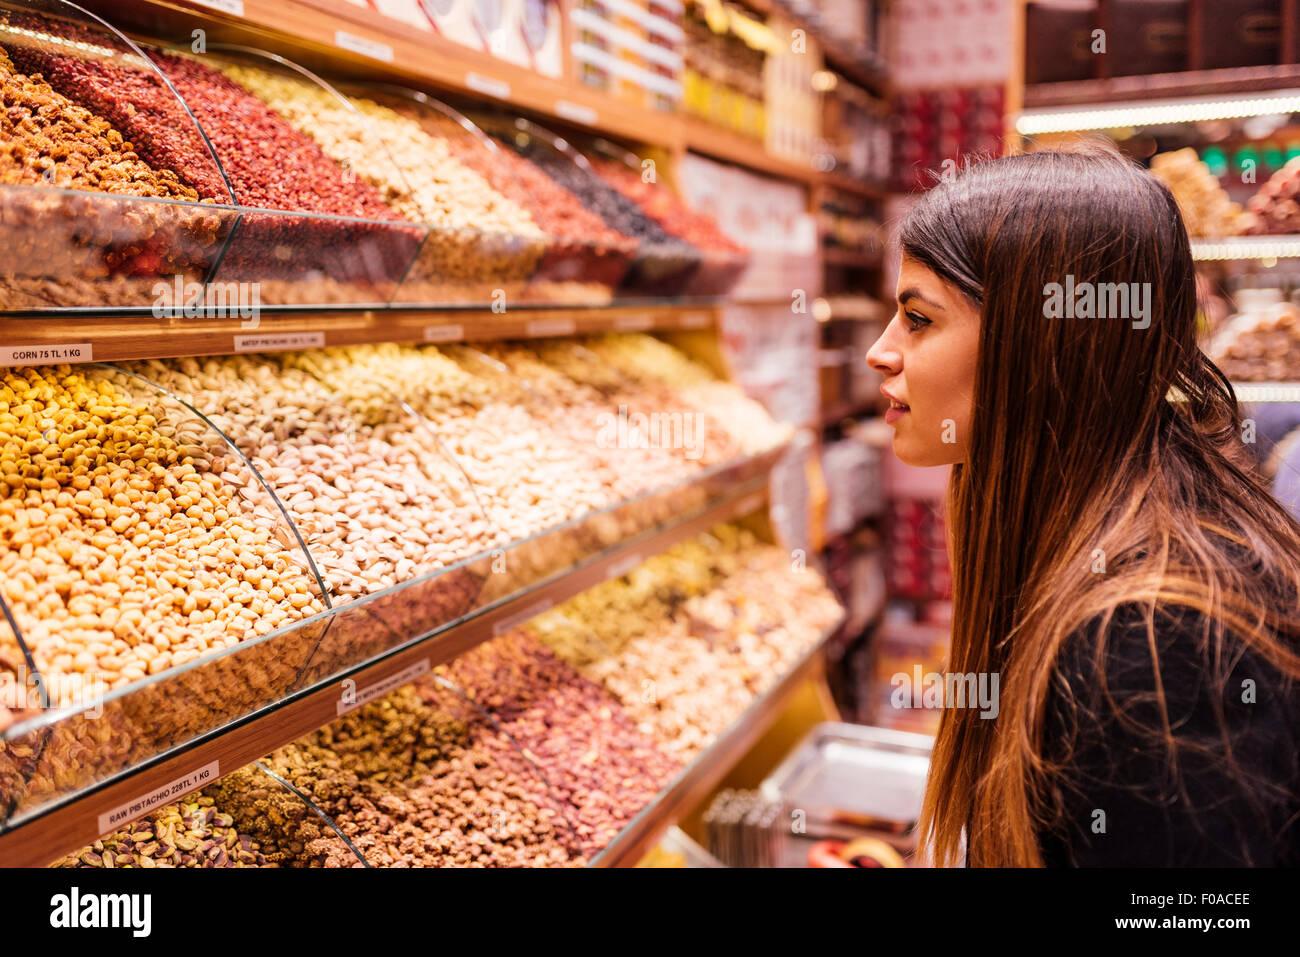 Junge Frau betrachten Lebensmittel Markt, Istanbul, Türkei Stockbild